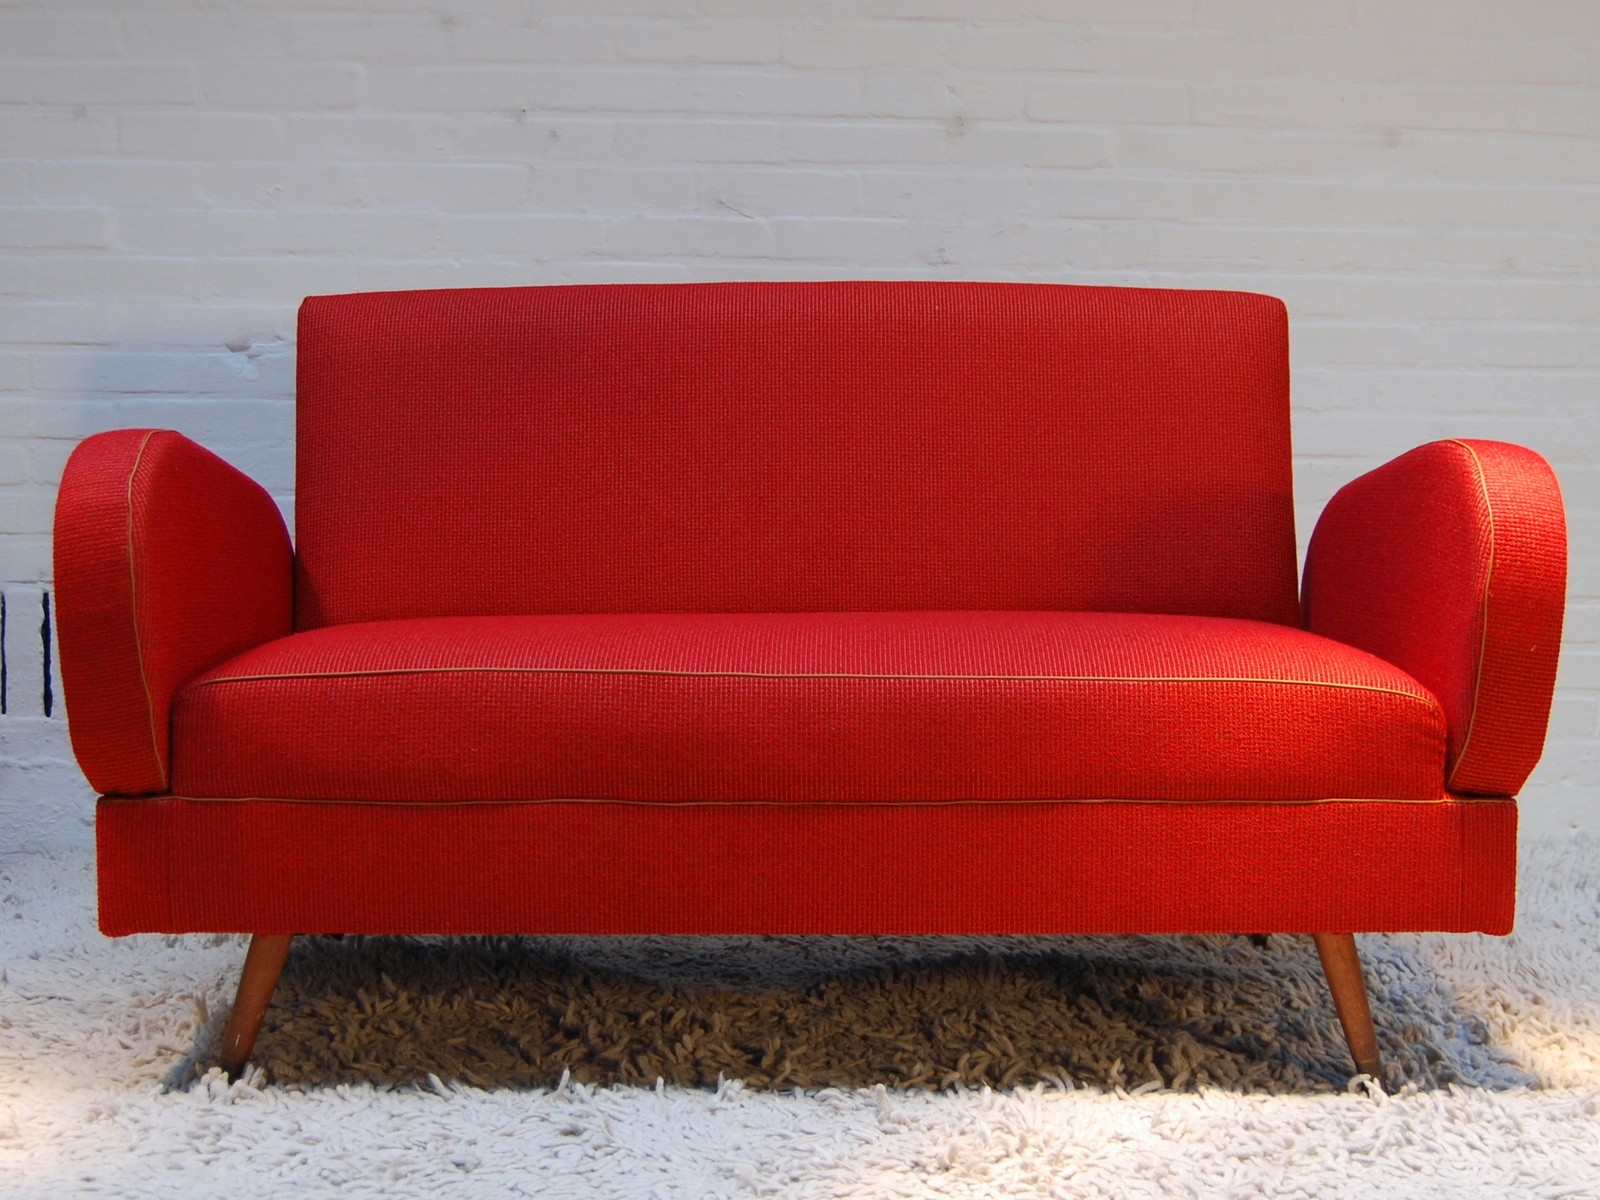 Mid century modern dark red sofa - 1960s